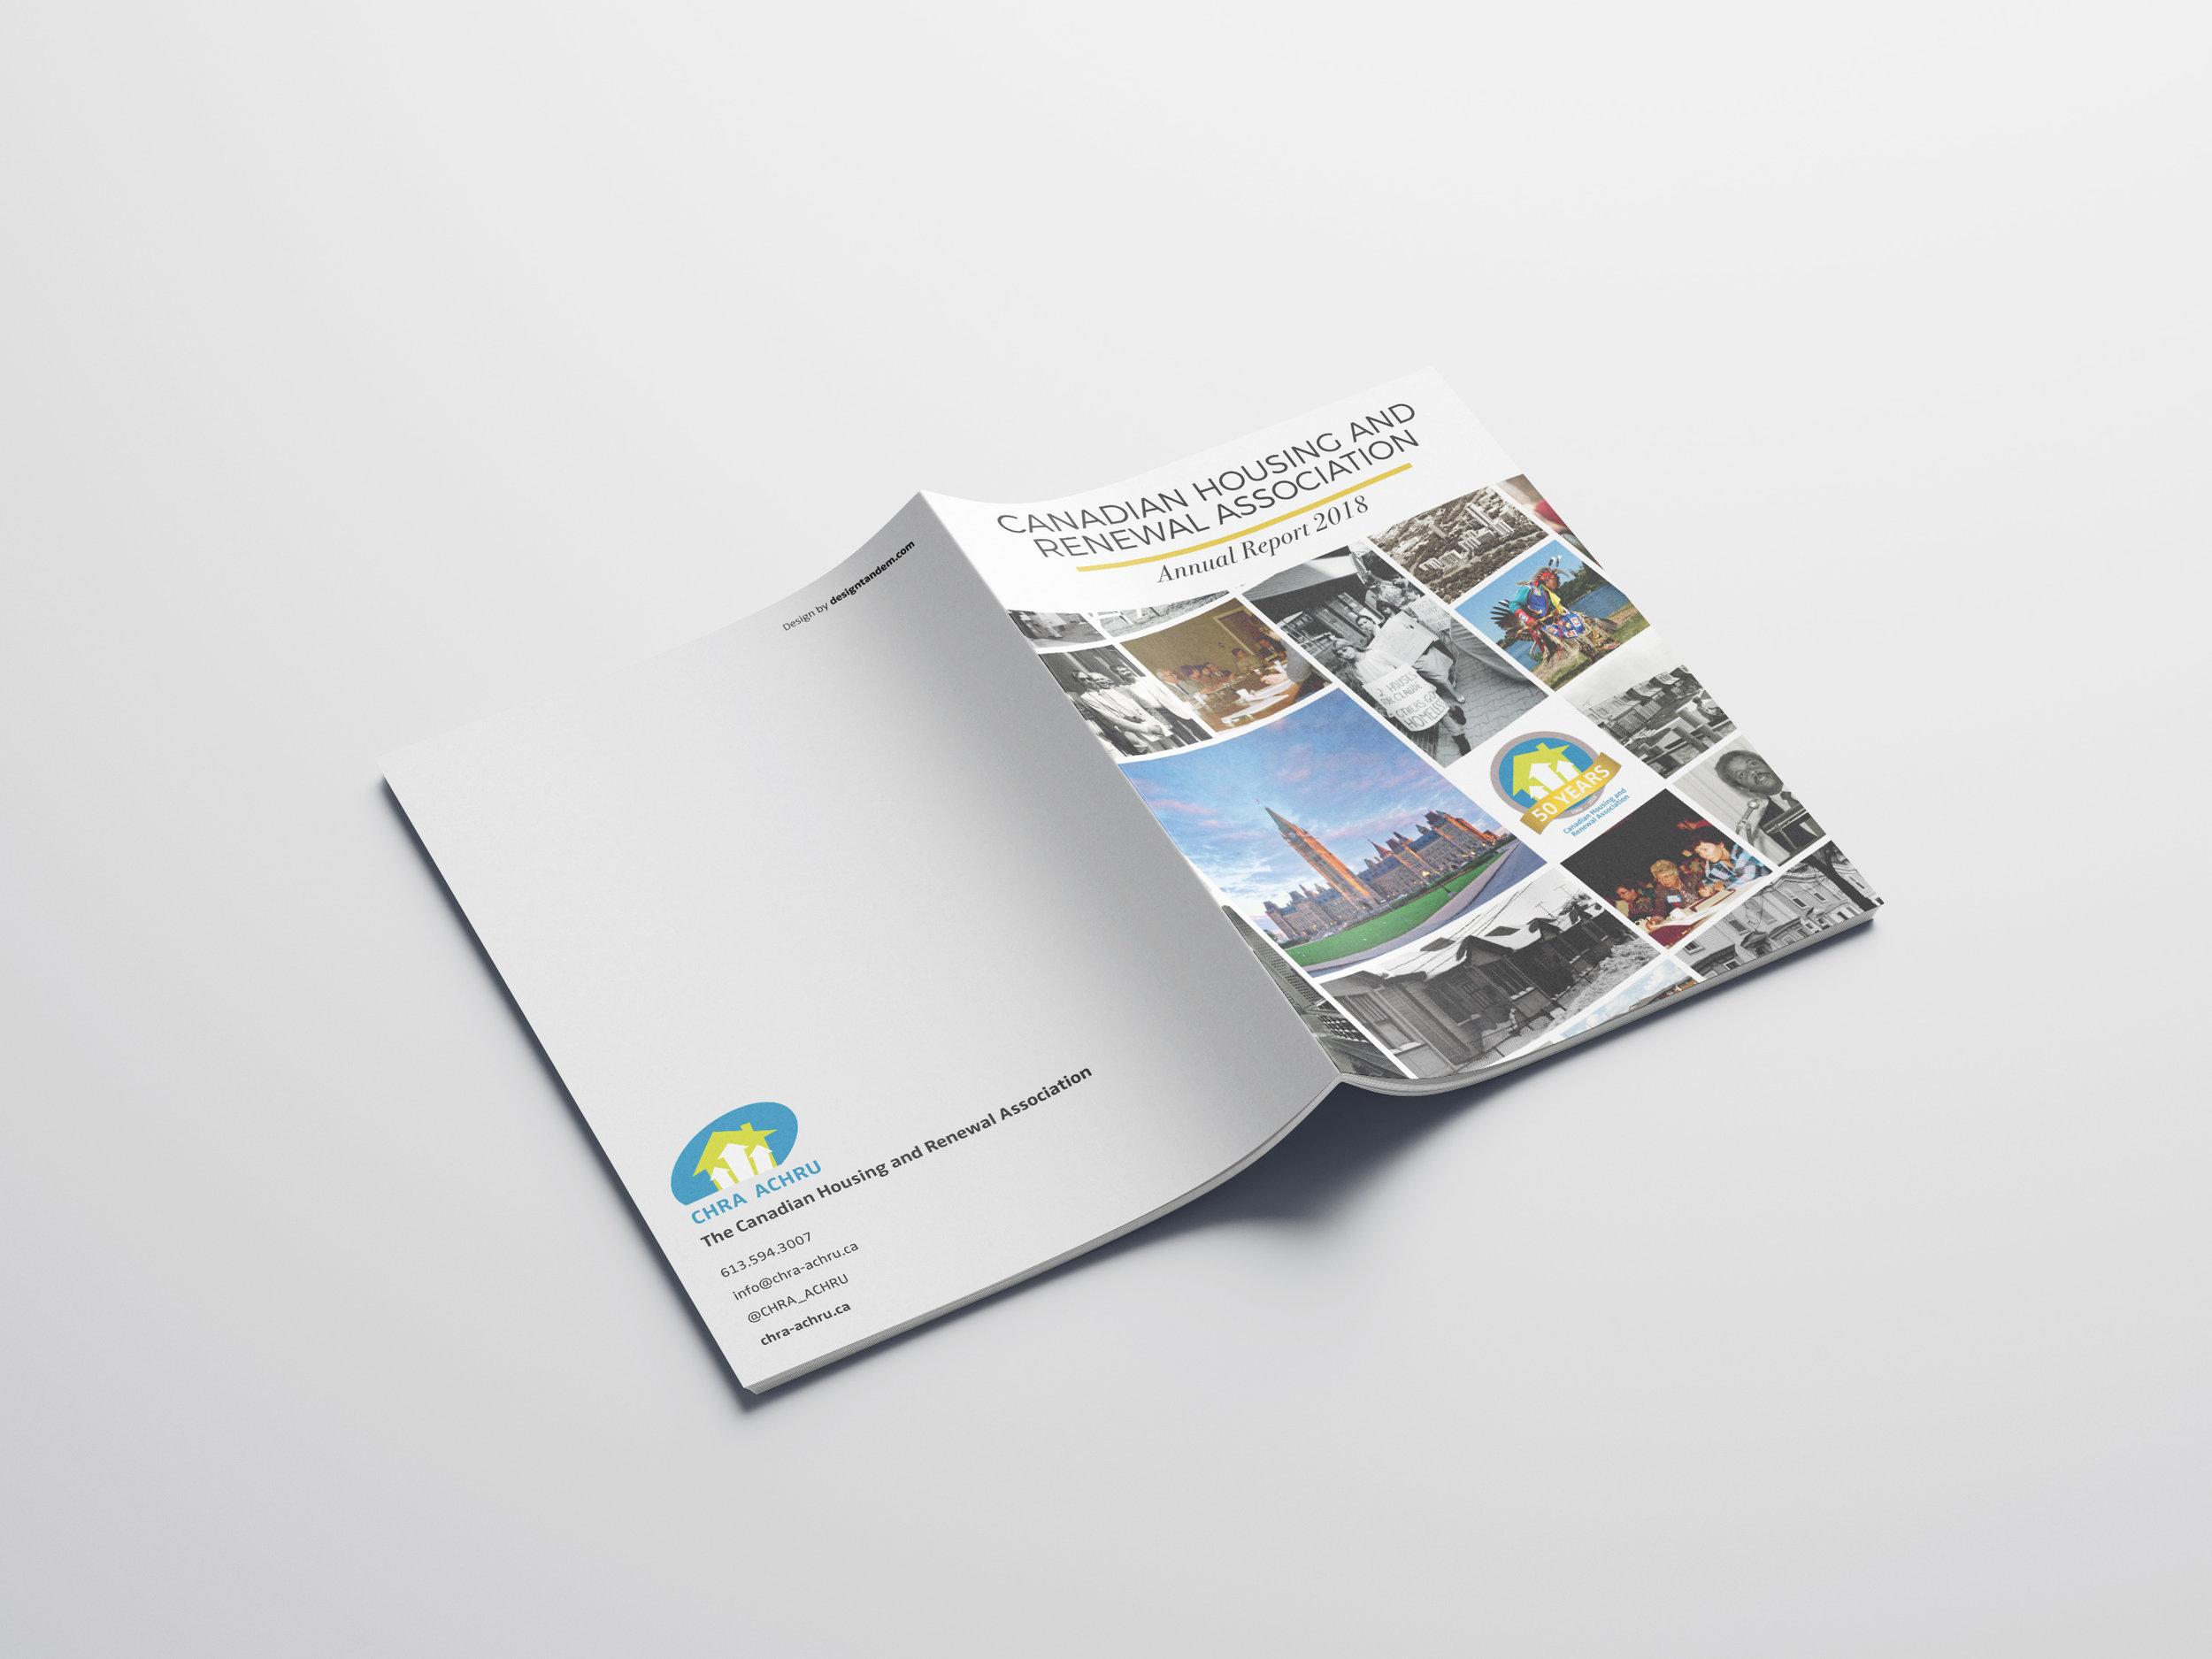 CHRA-2018-Annual-Report-Covers.jpg